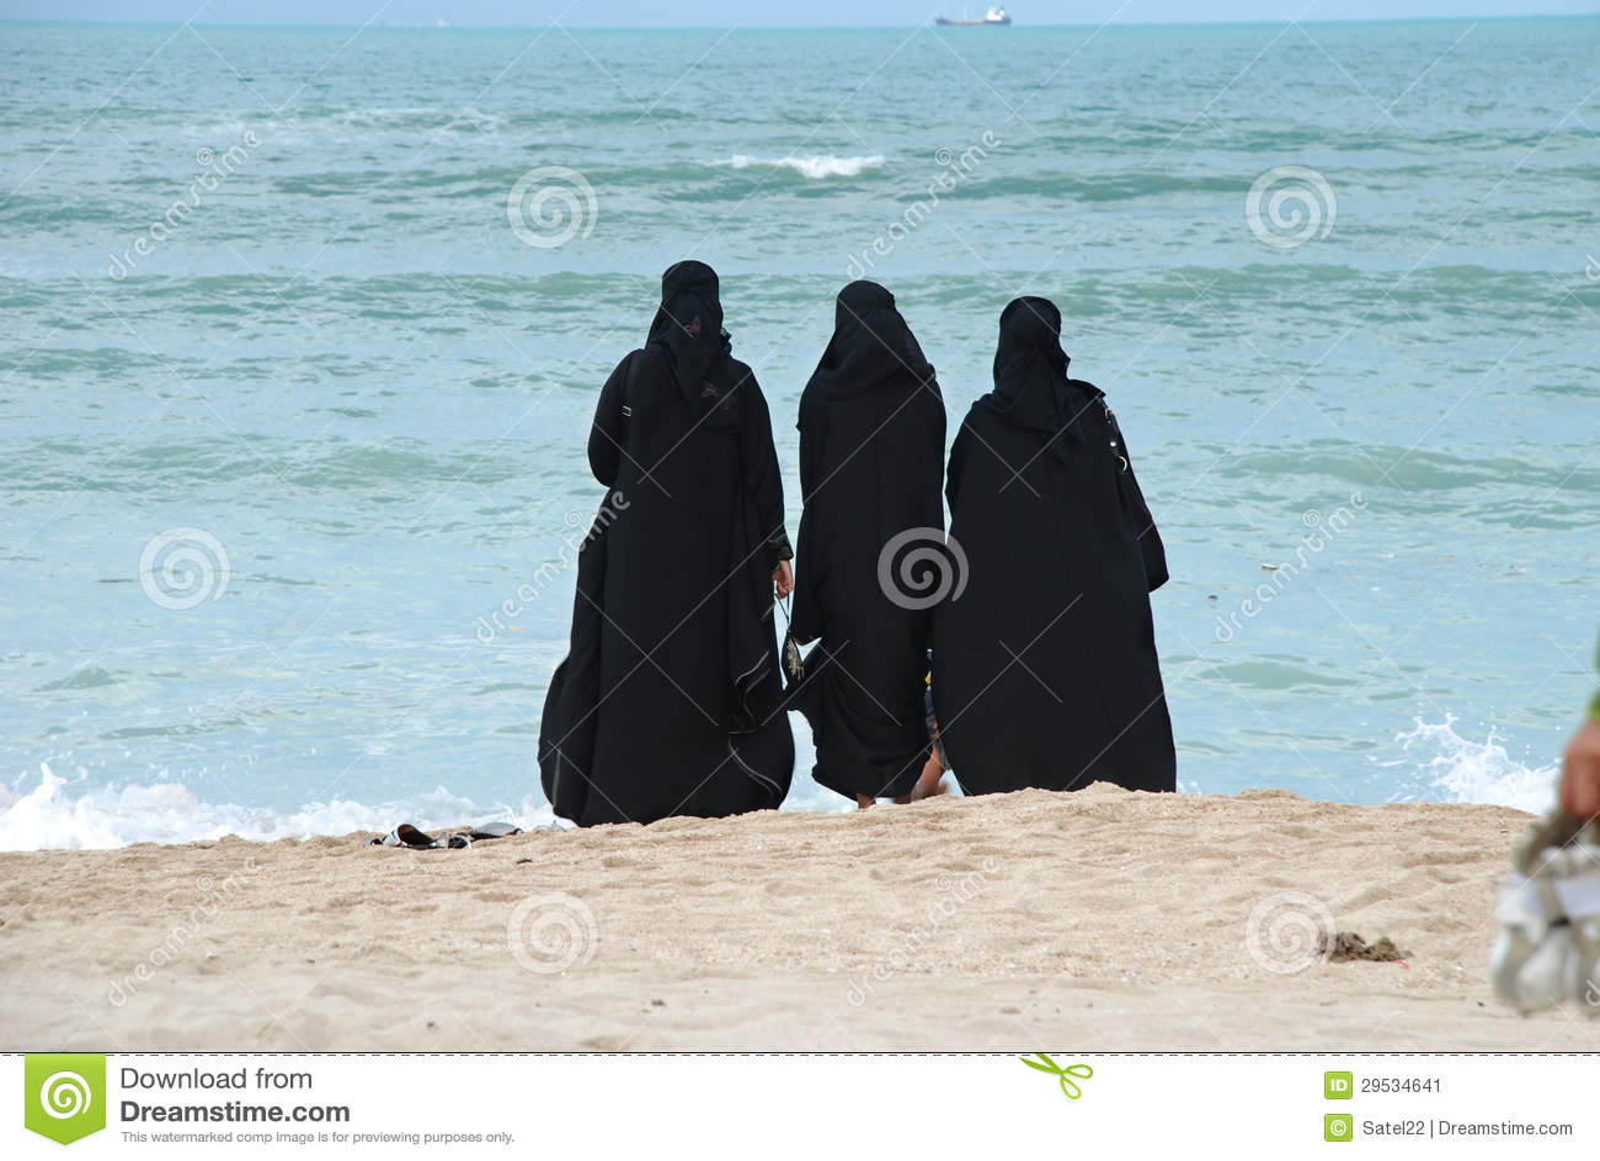 Group of arab women